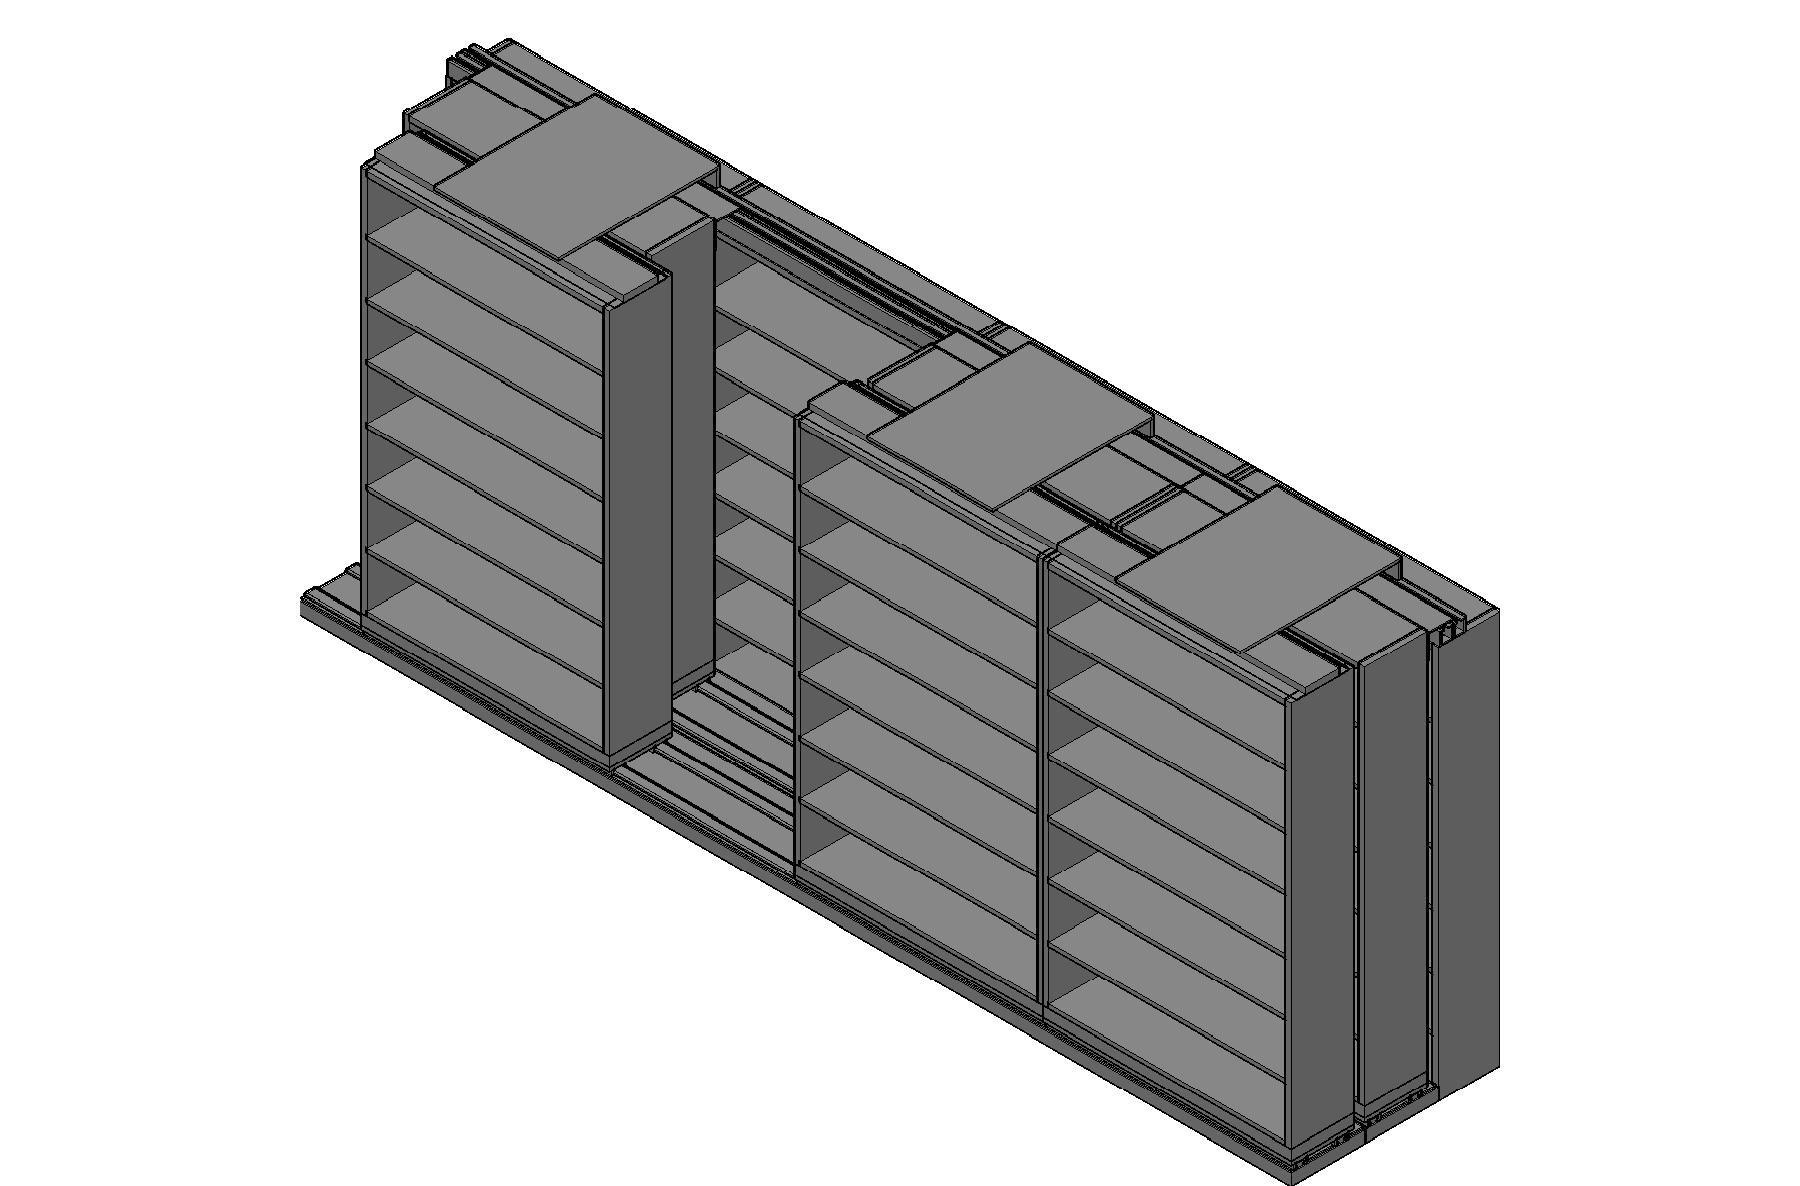 "Letter Size Sliding Shelves - 3 Rows Deep - 7 Levels - (48"" x 12"" Shelves) - 196"" Total Width"